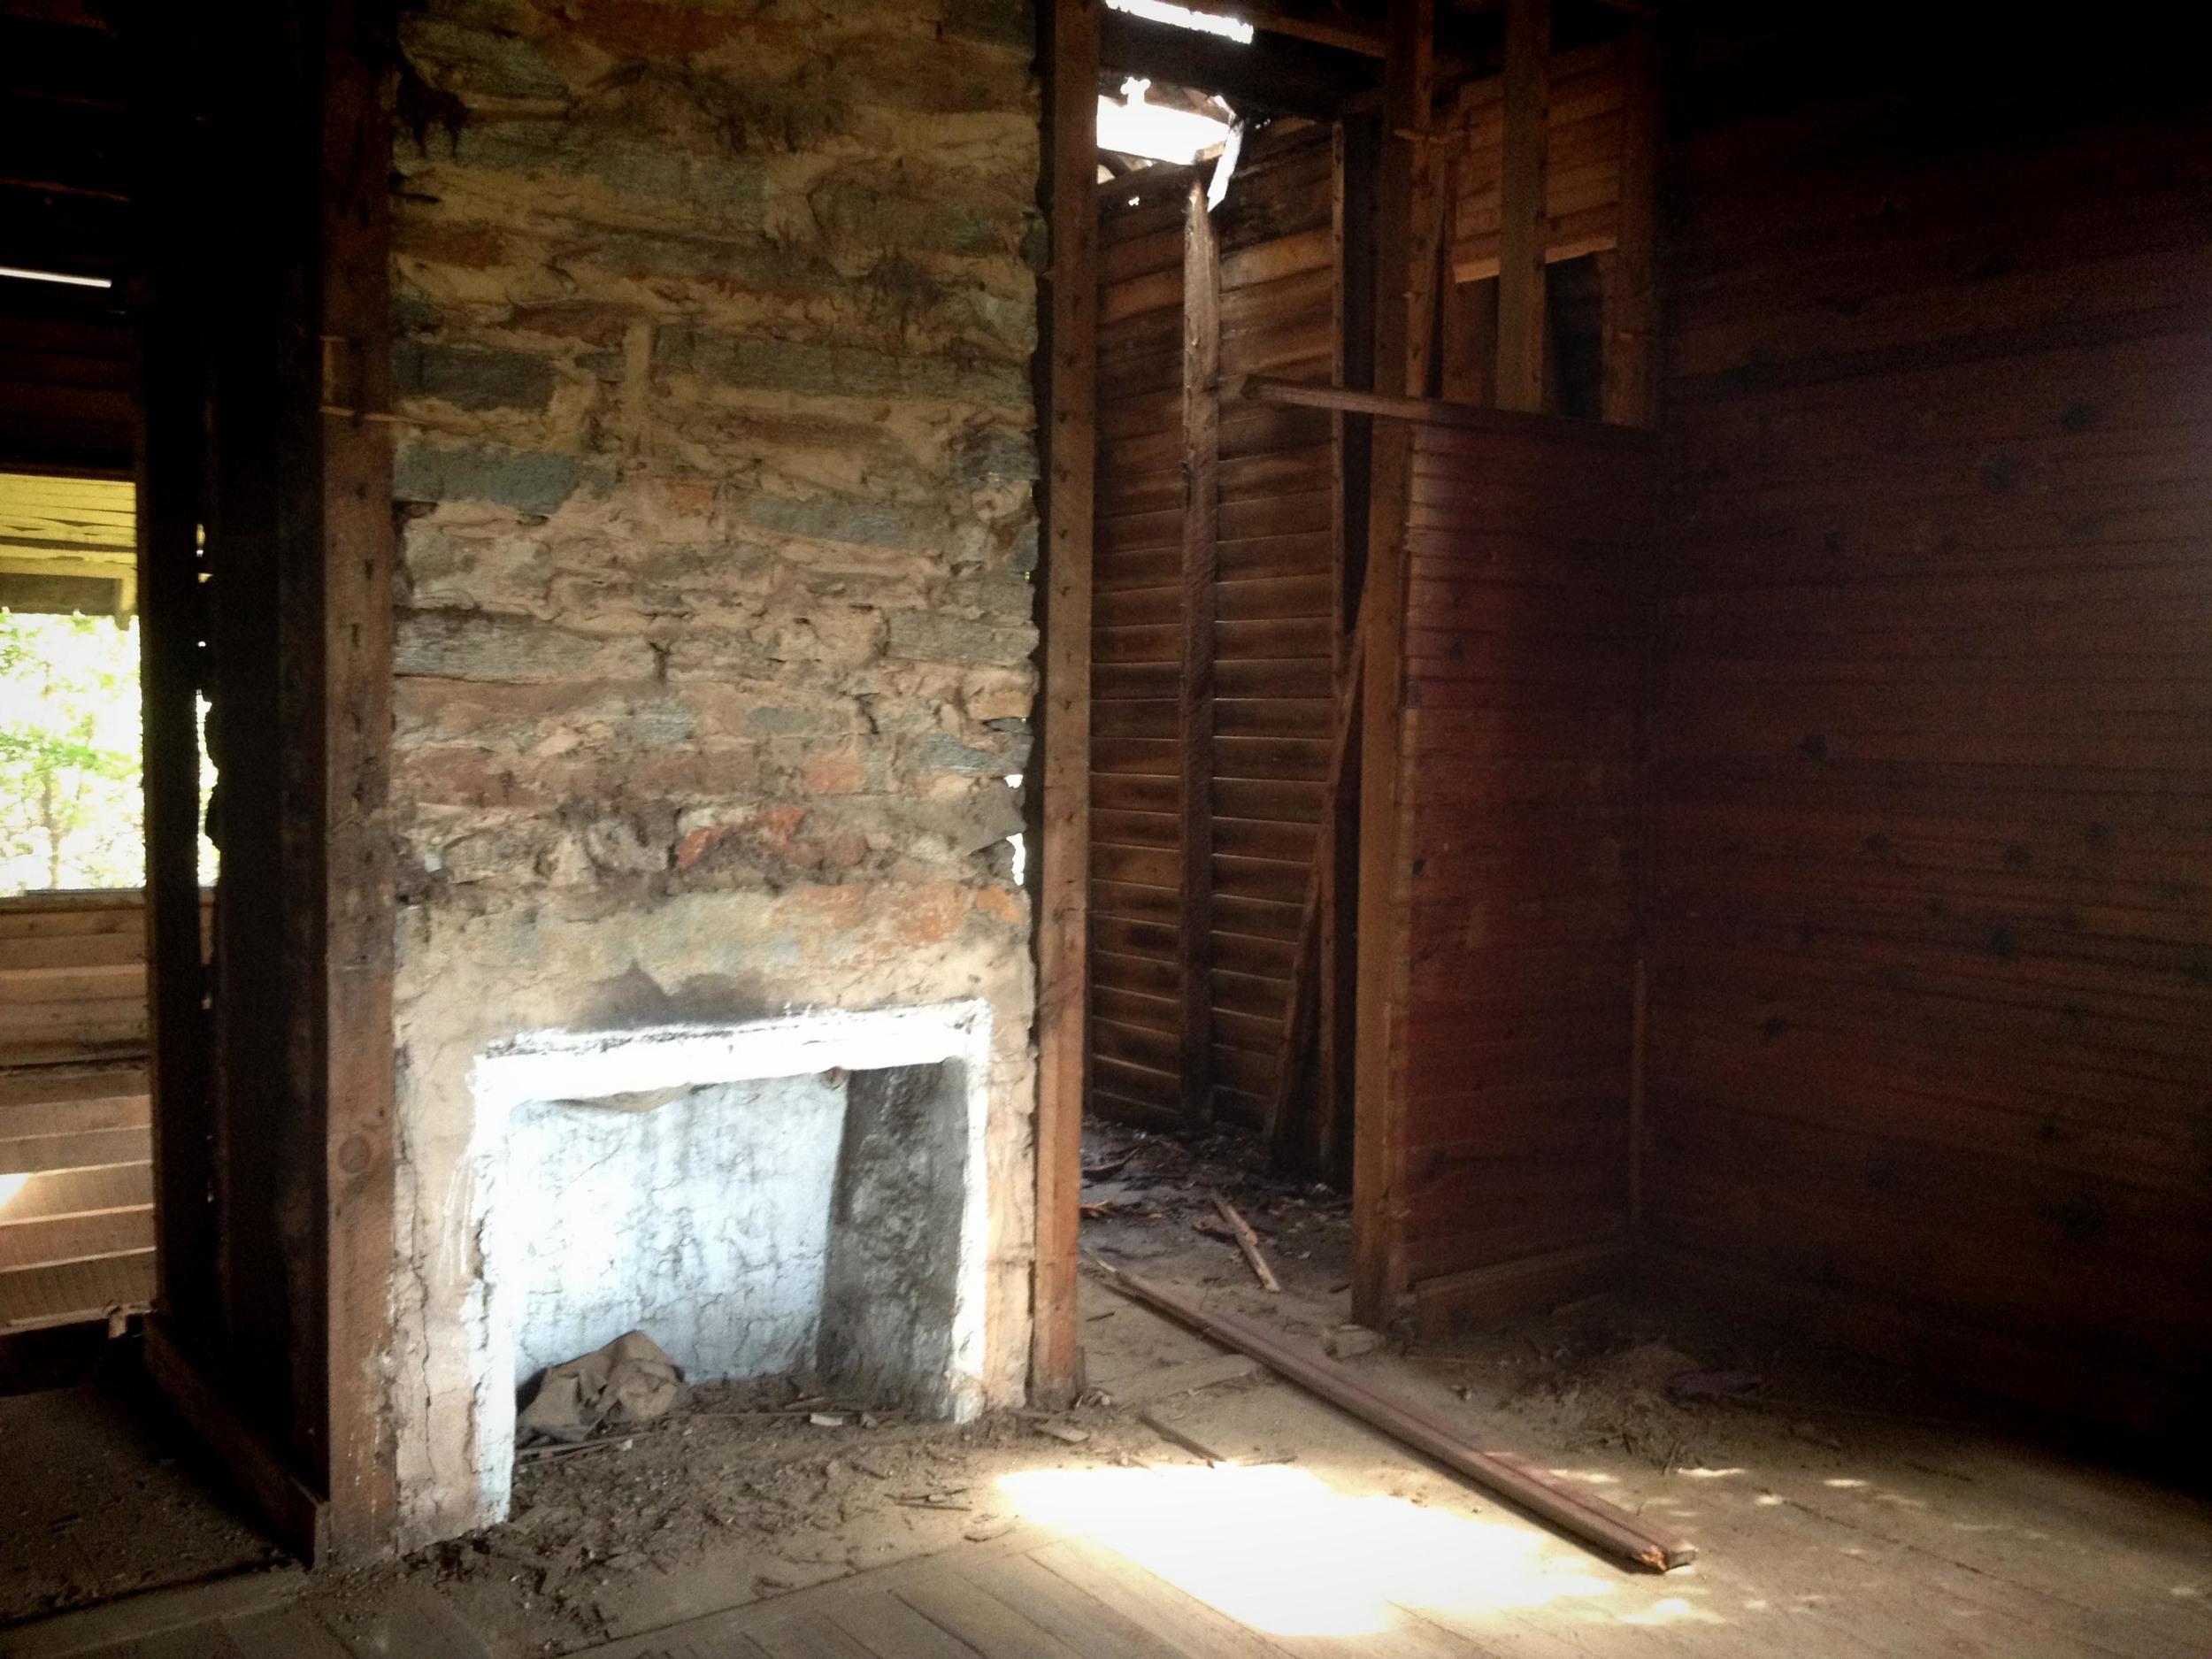 Reclaiming a home via Drum Homes